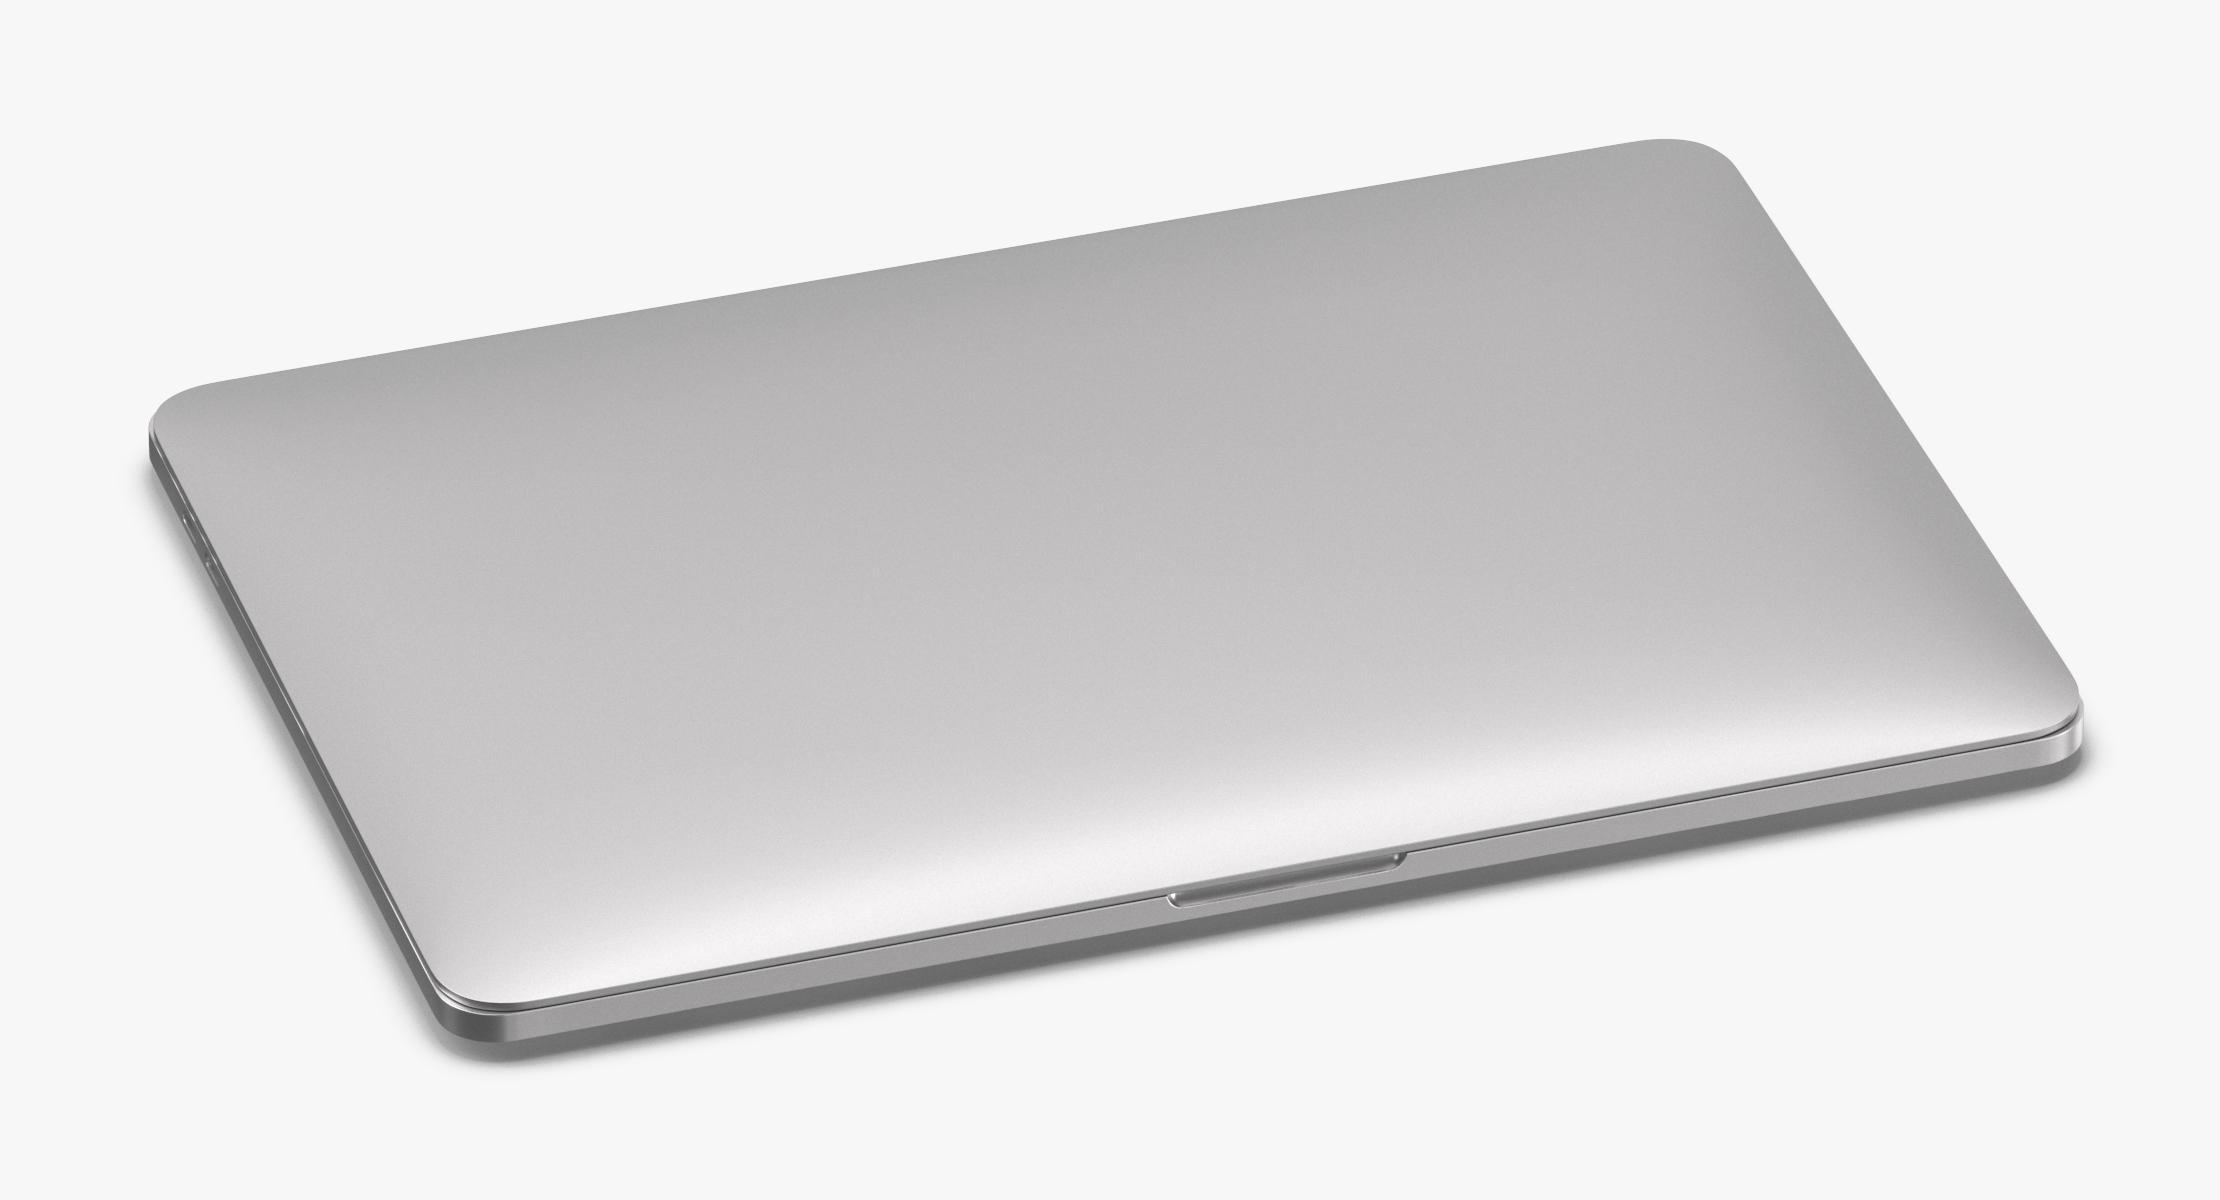 Generic Laptop Closed - reel 1